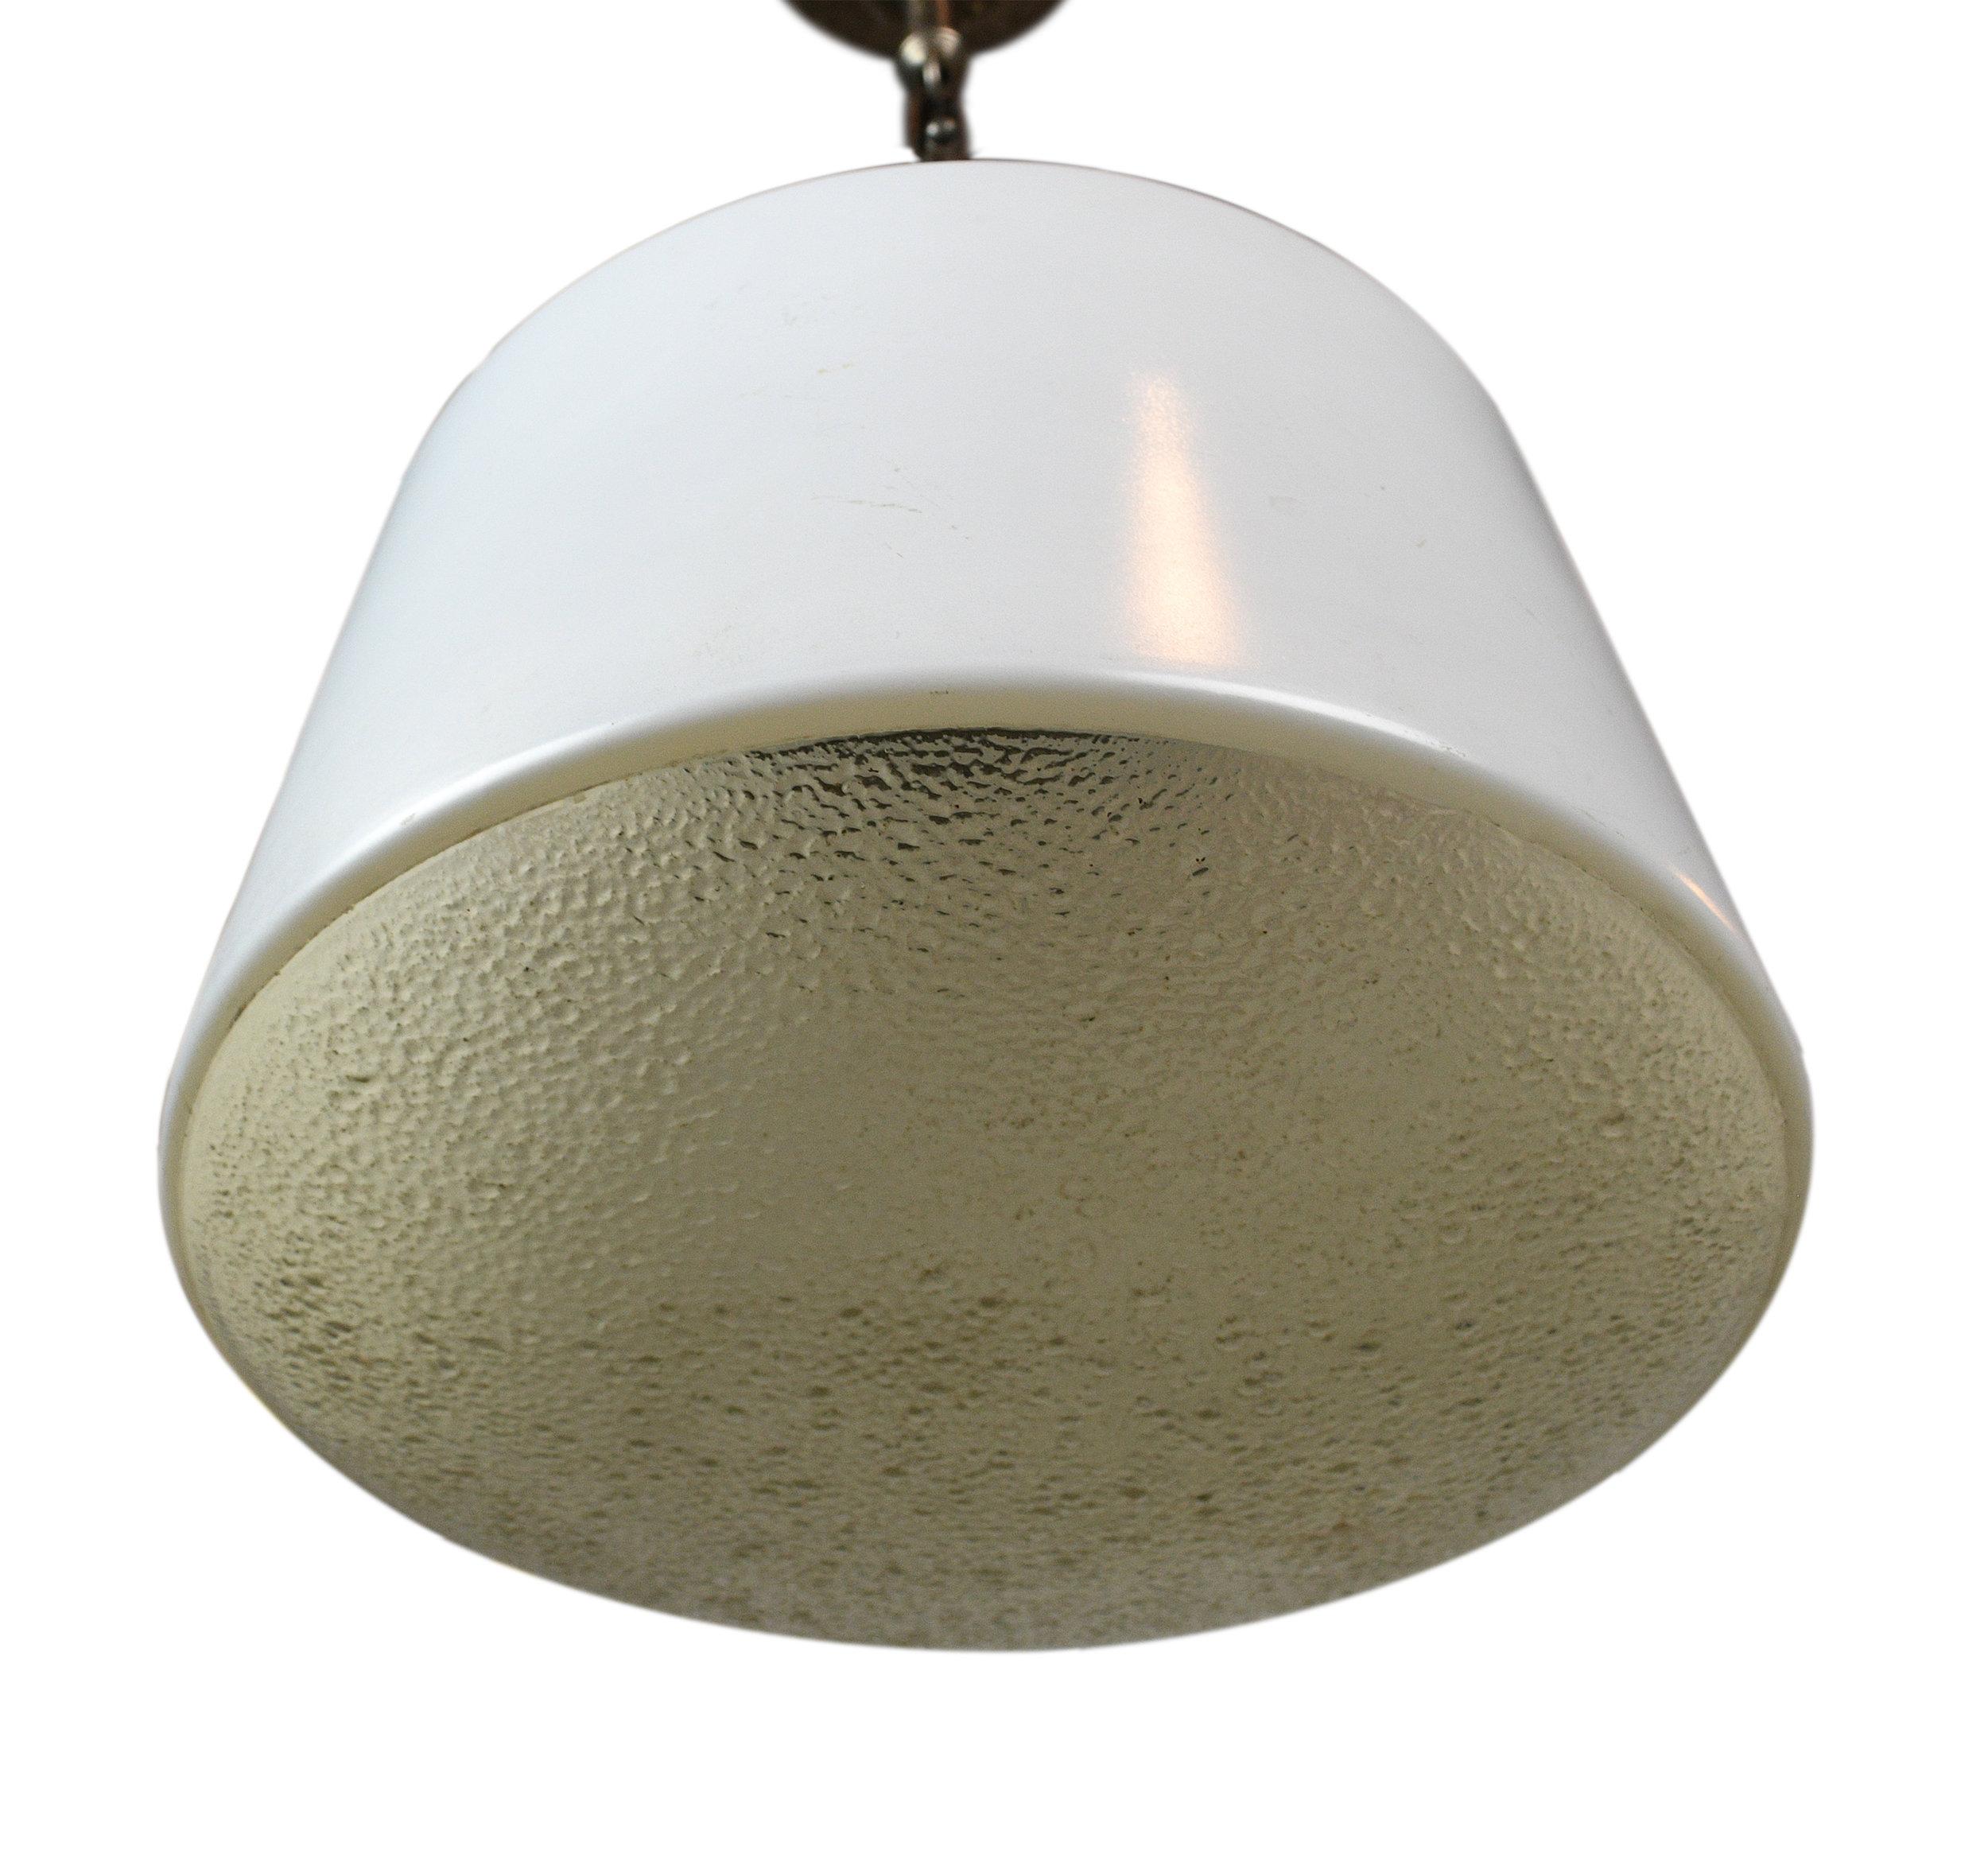 47836-egg-and-dart-pendant-with-school-shade-12.jpg